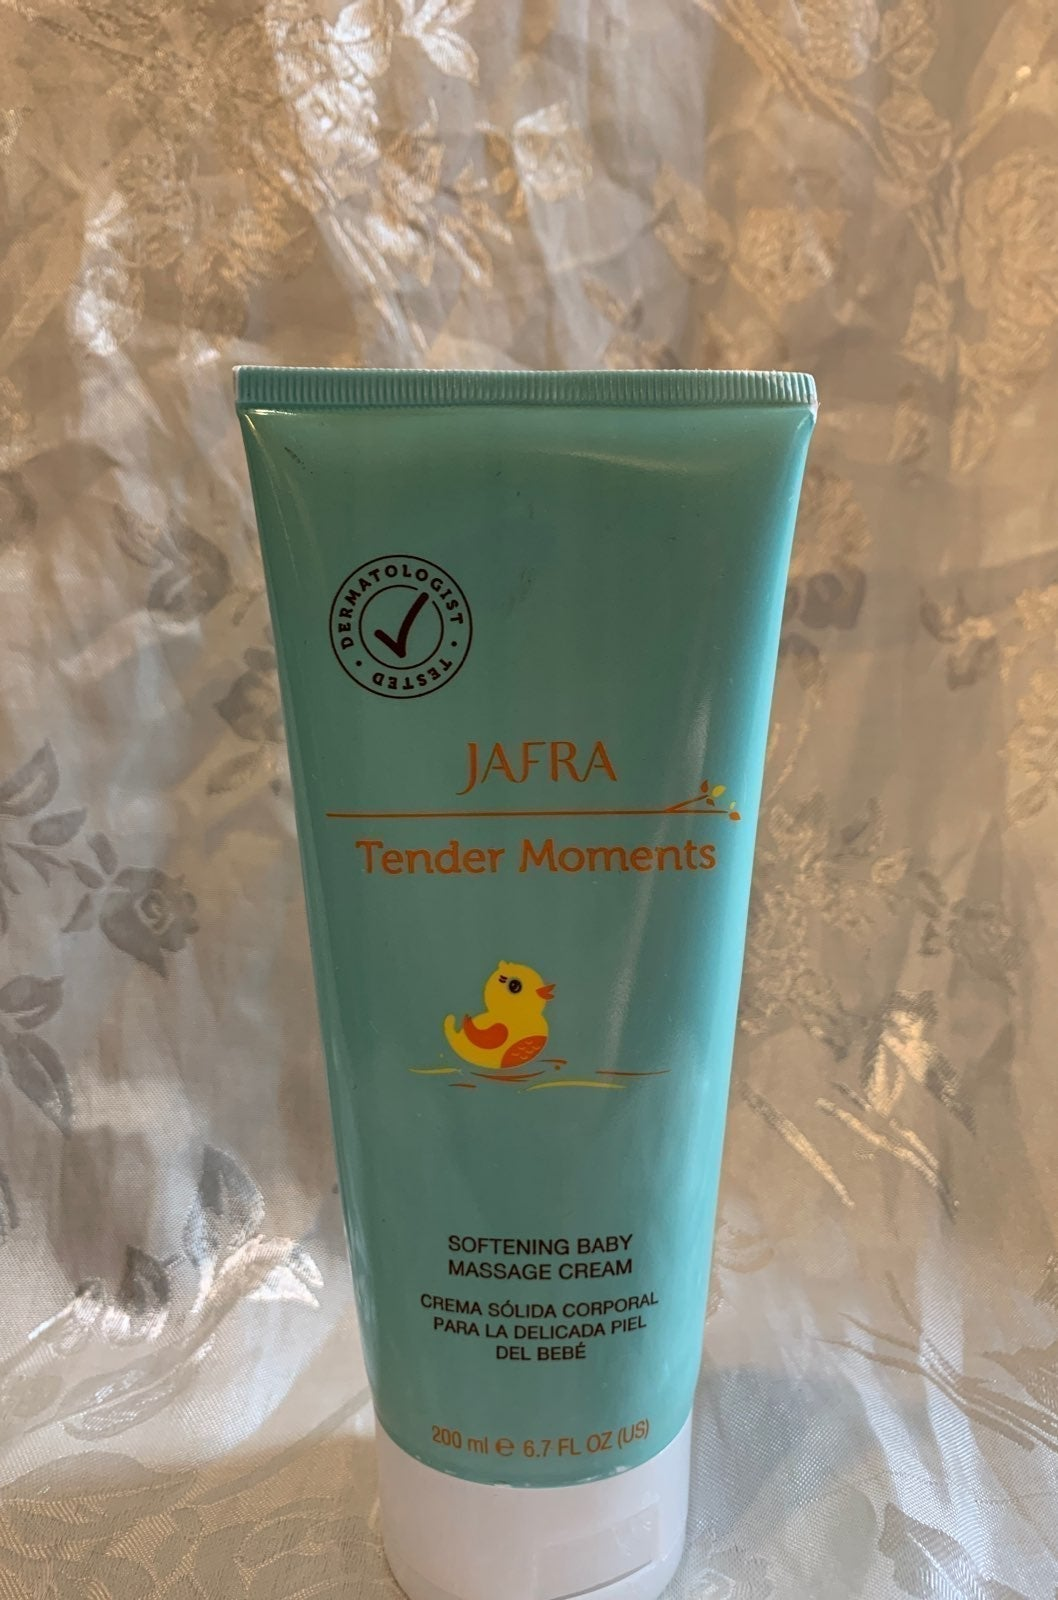 Baby massage cream